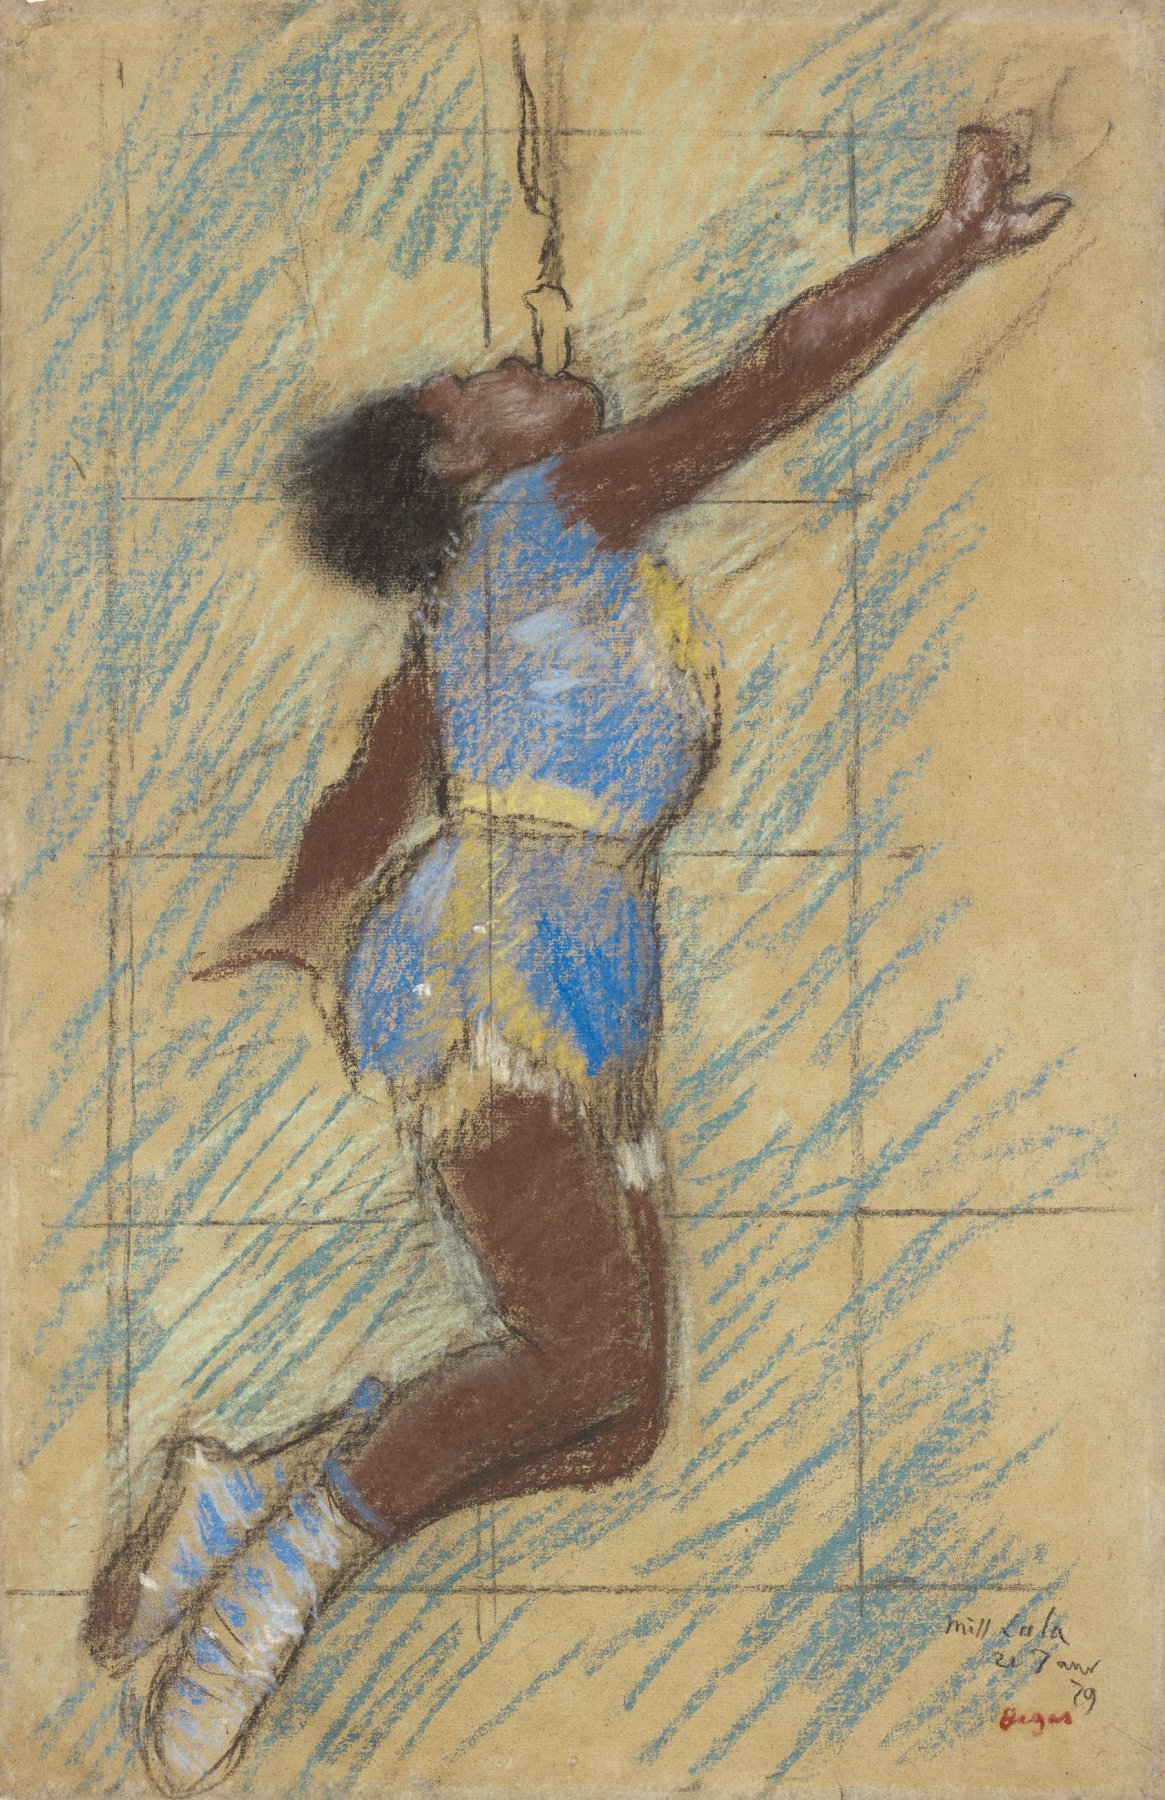 Edgar Degas. Miss La La at the circus Fernando (sketch)